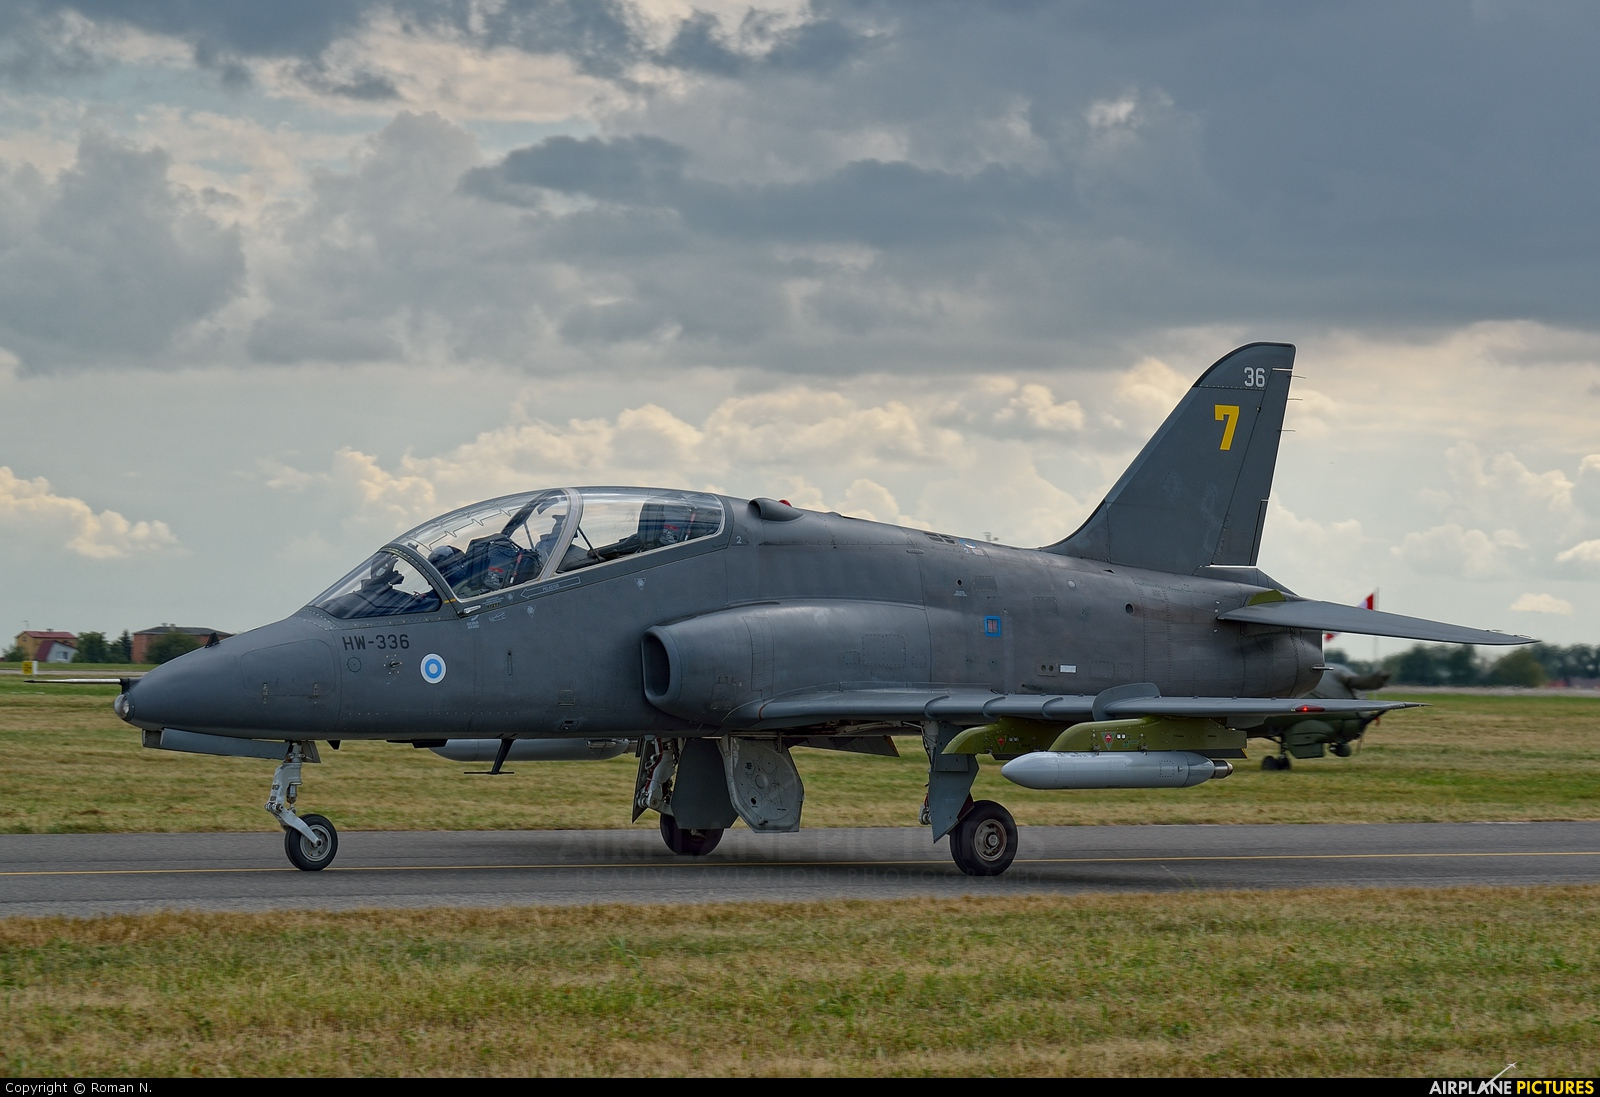 Finland - Air Force: Midnight Hawks HW-336 aircraft at Radom - Sadków